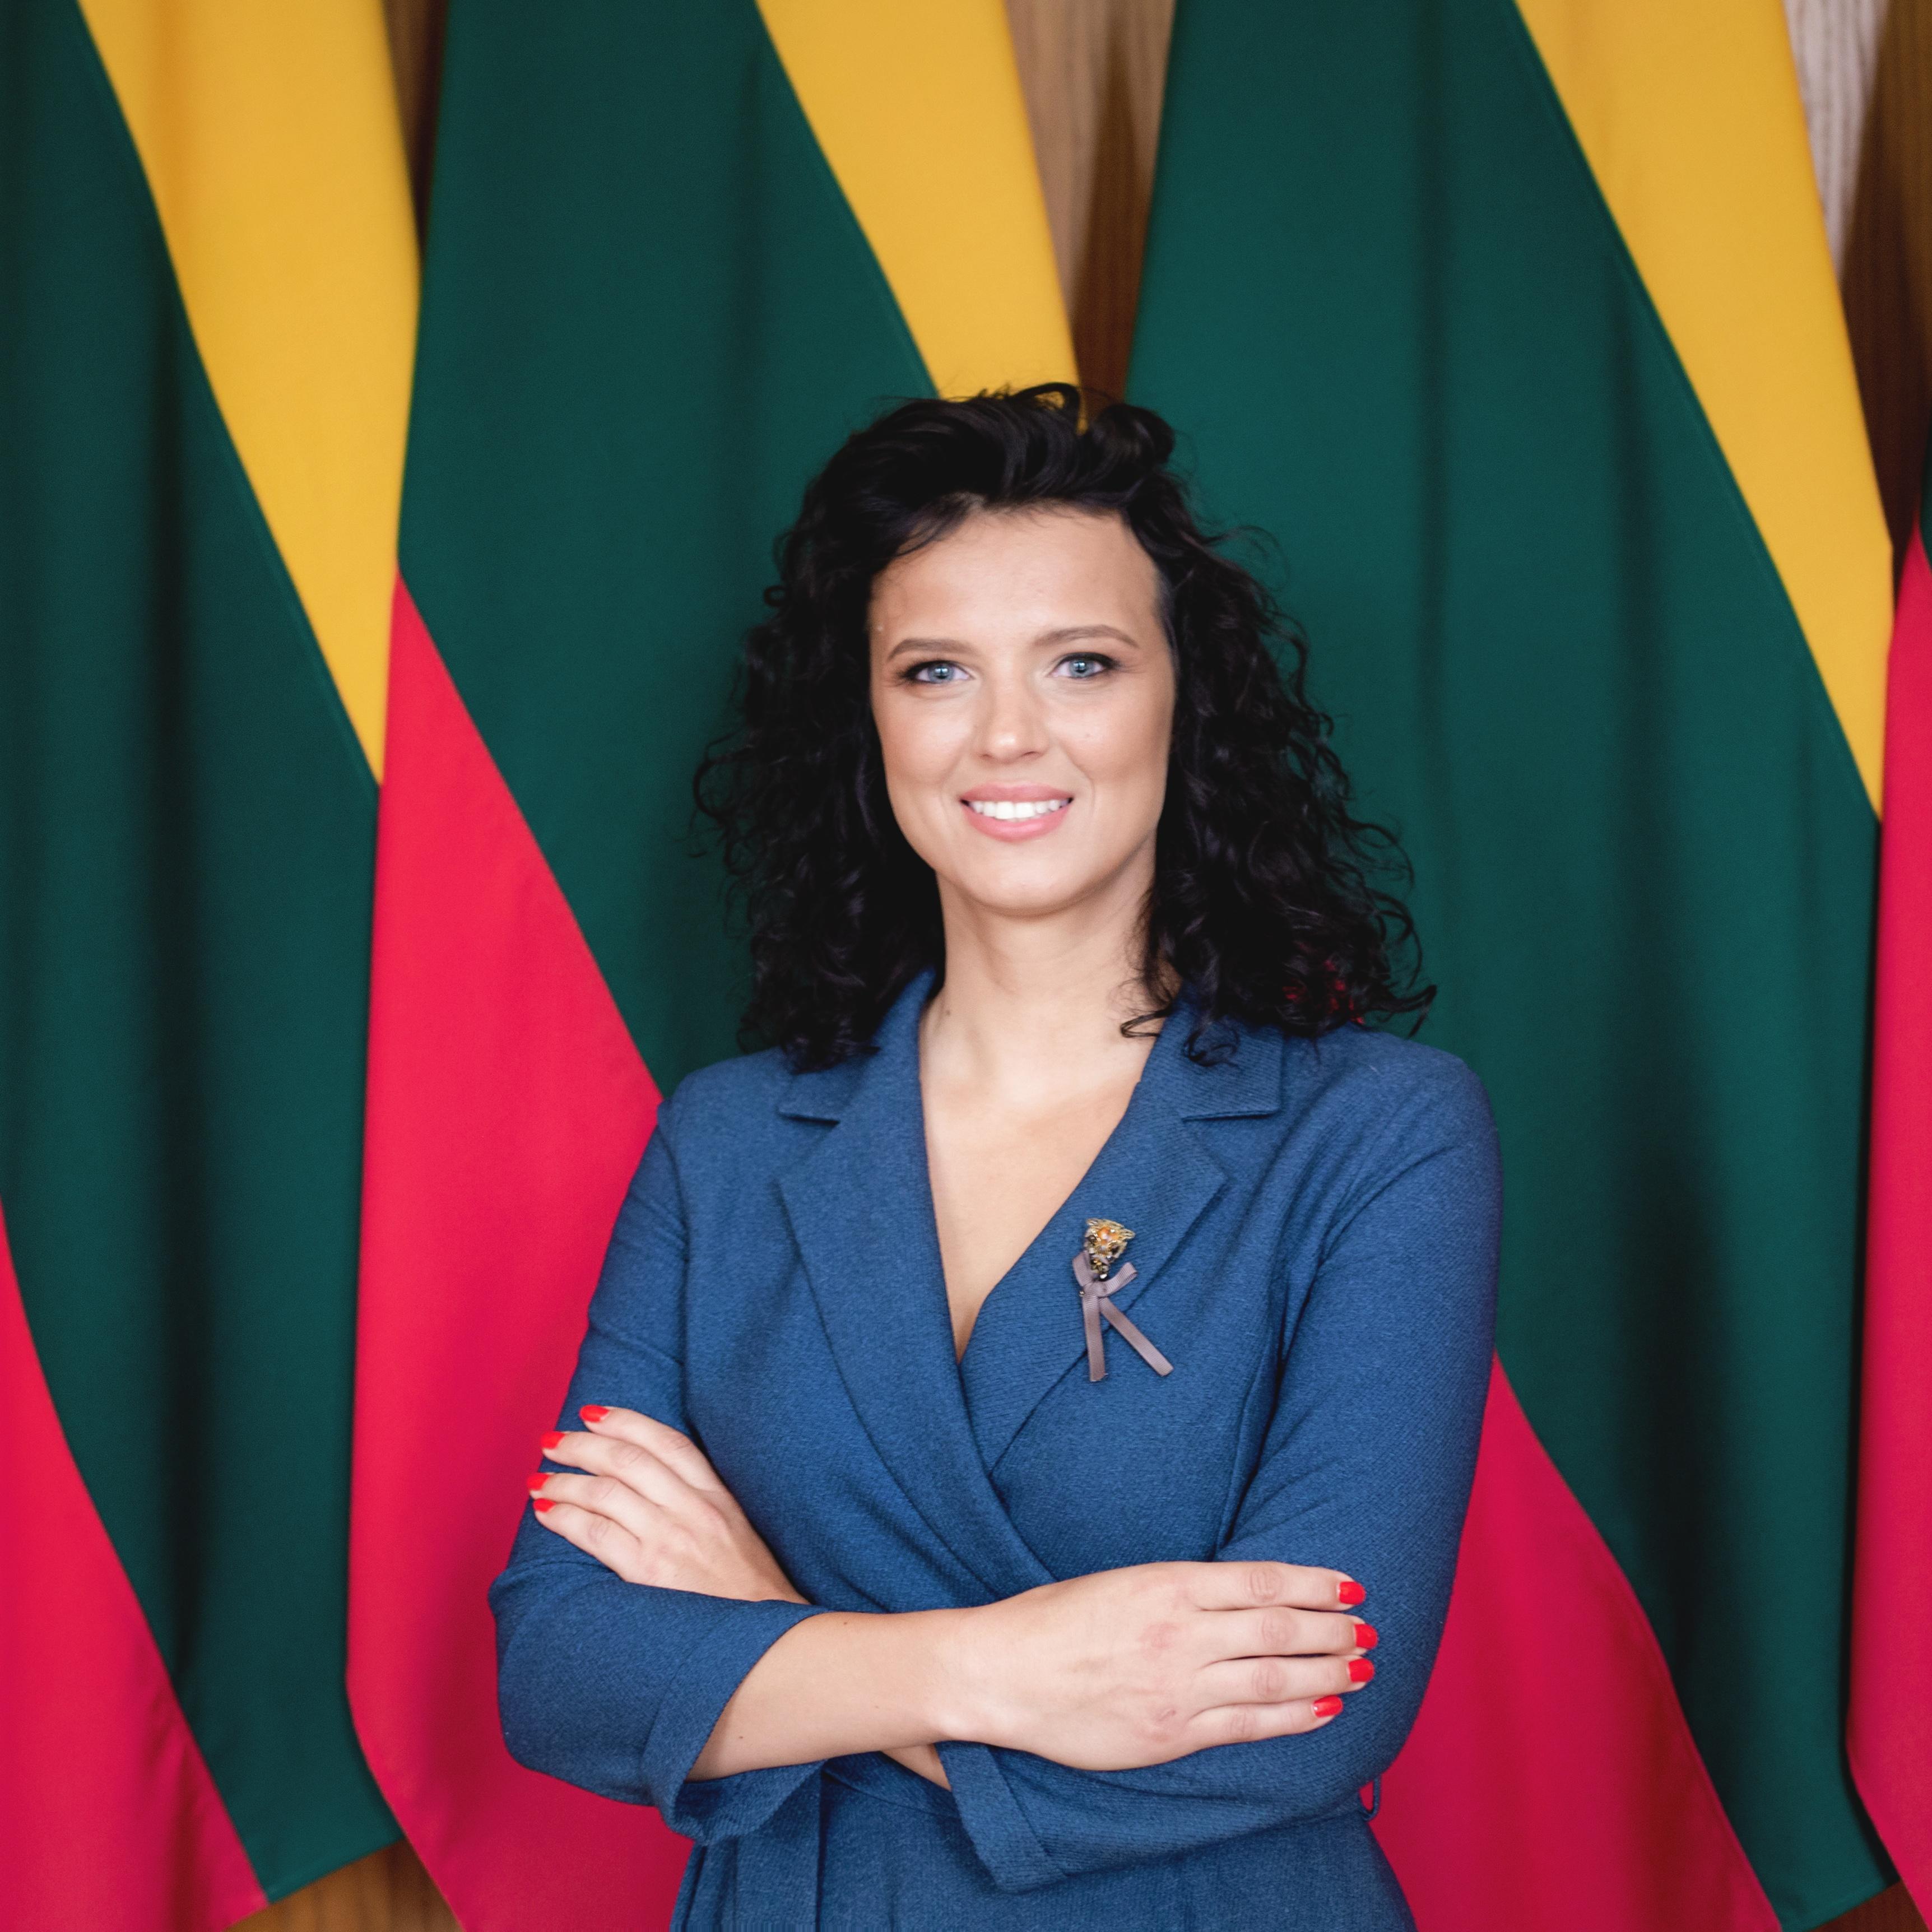 Ms Alina Adomaityte